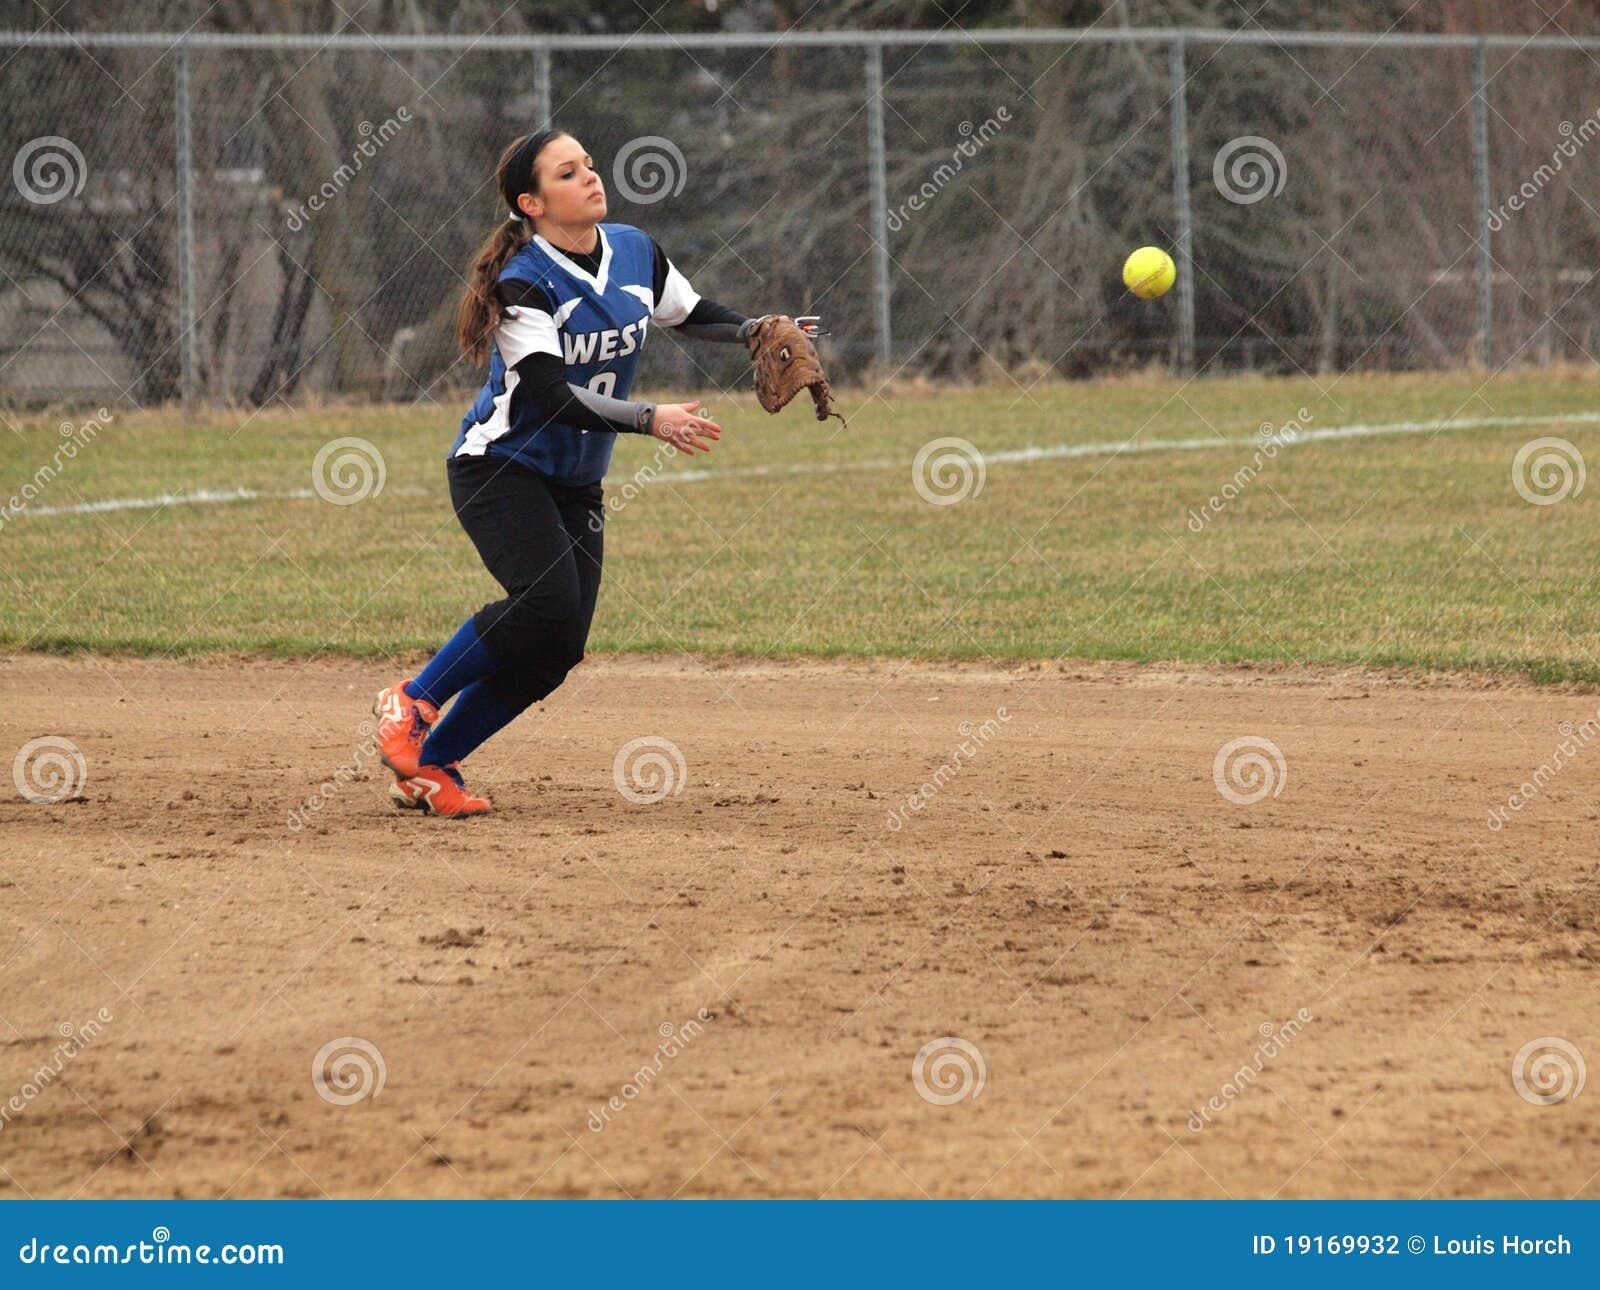 Girls Softball | girl ... Girls Softball